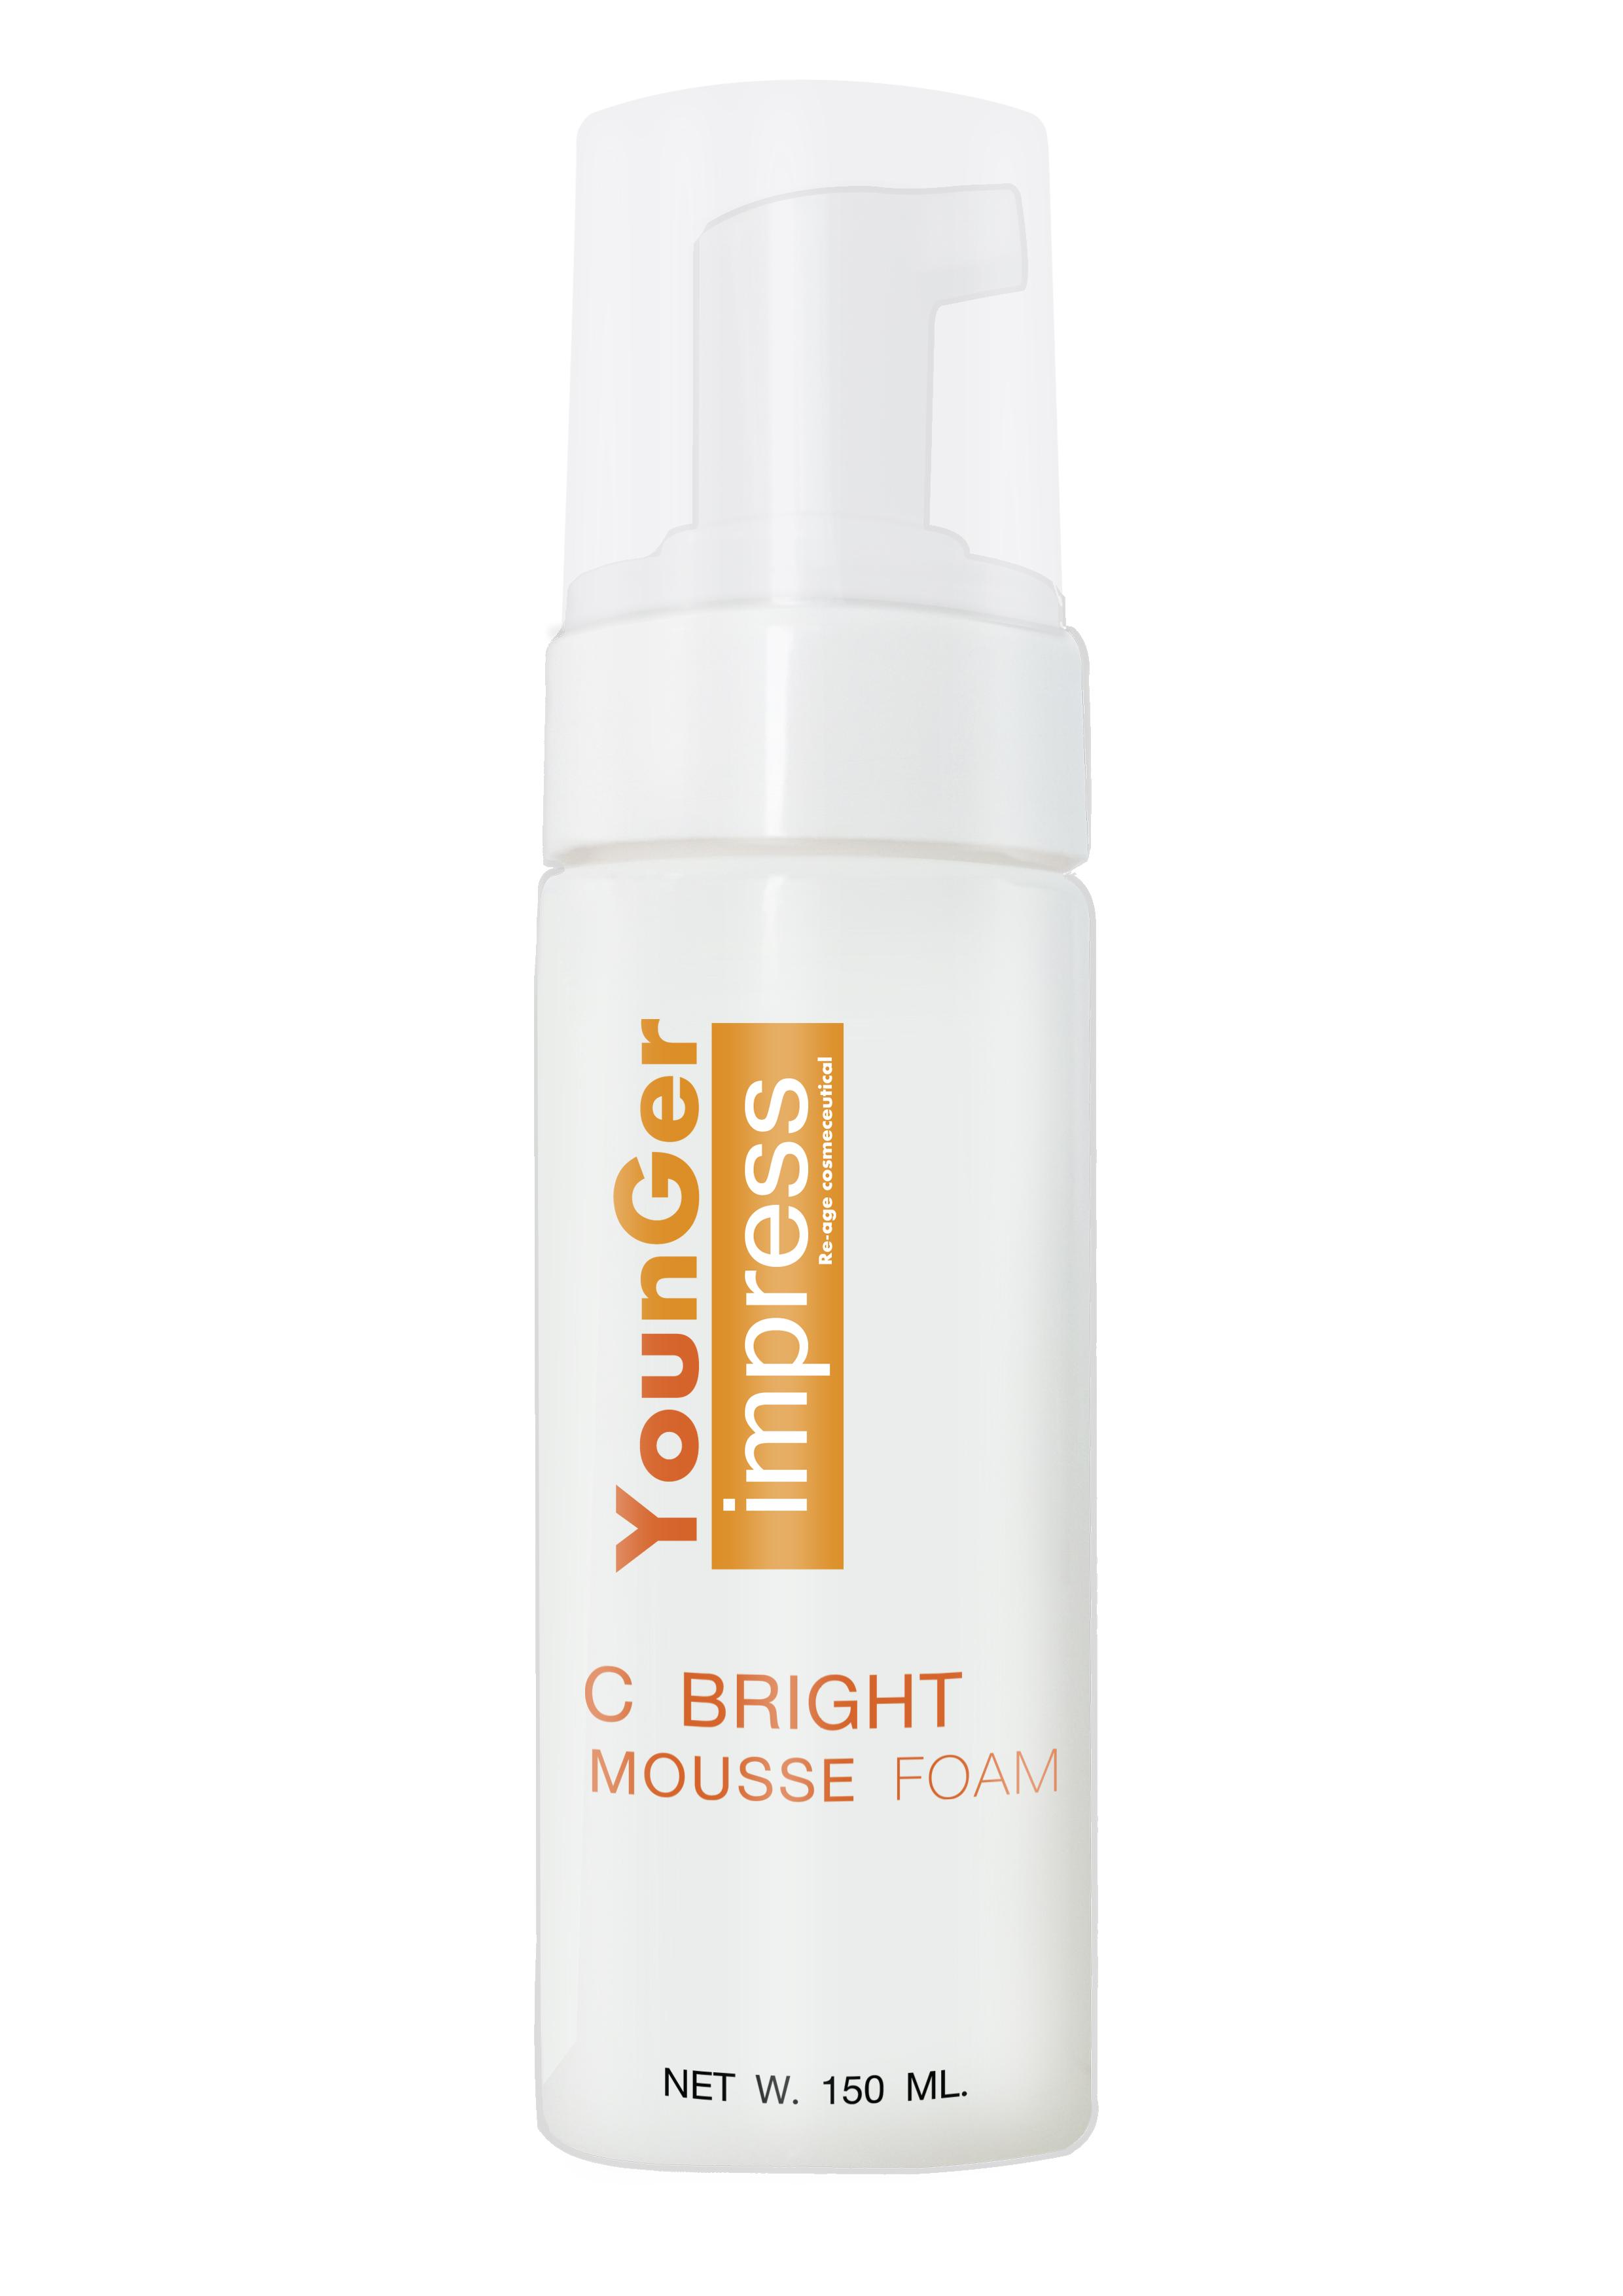 Younger Impress C Bright Mousse Foam โฟมล้างหน้า มูส Vitamin C150 ml.